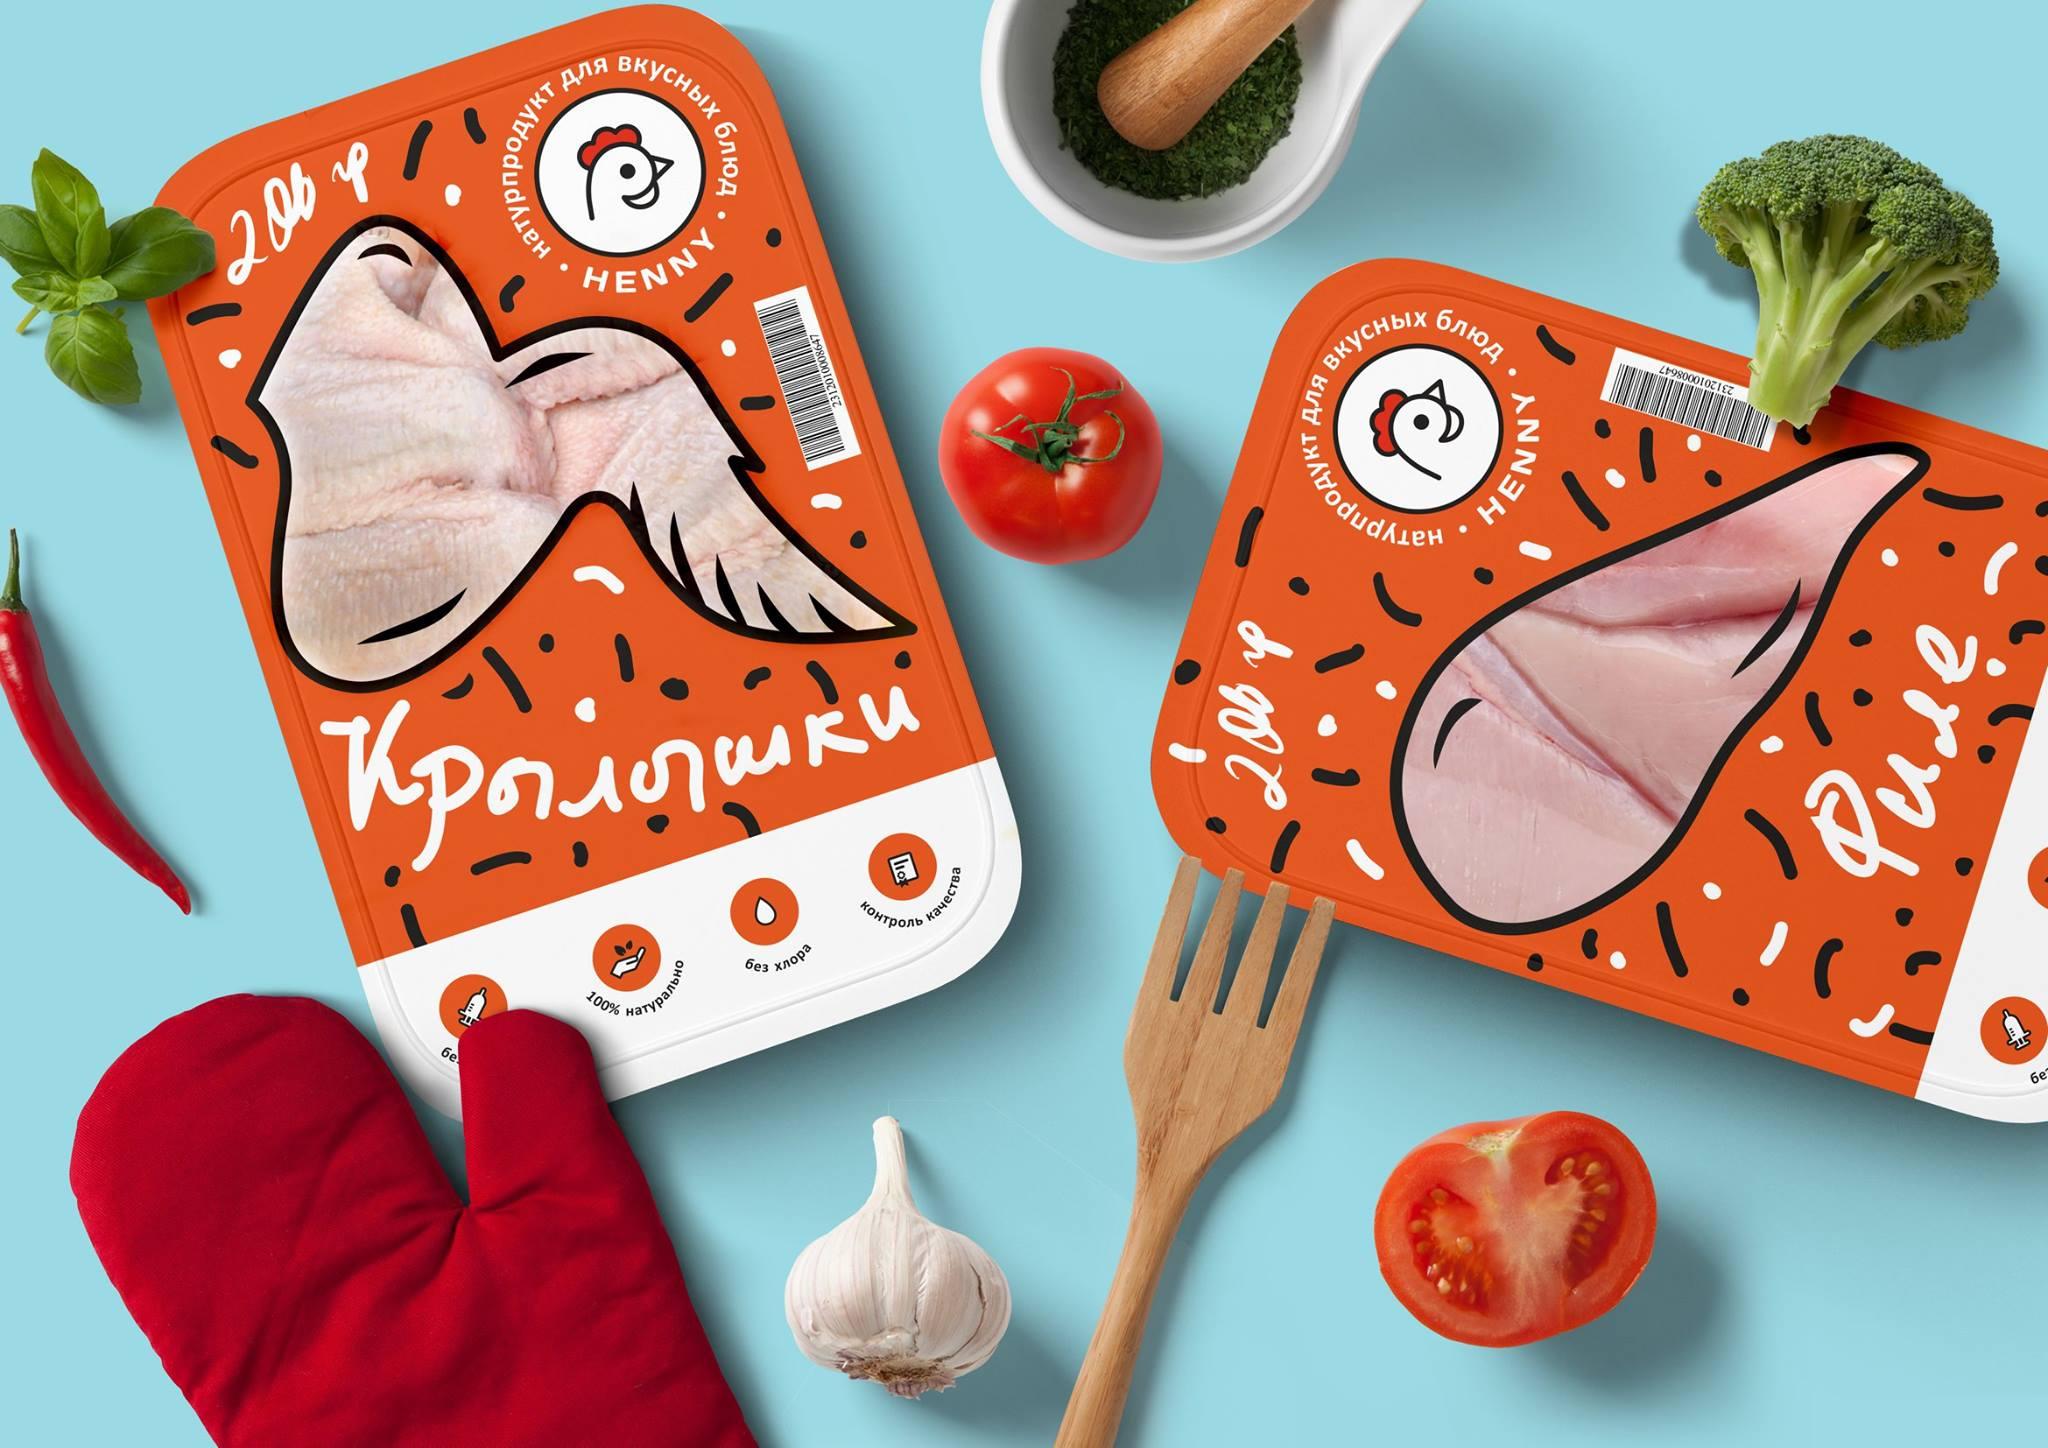 Дизайн упаковки, нейминг и логотип HENNY